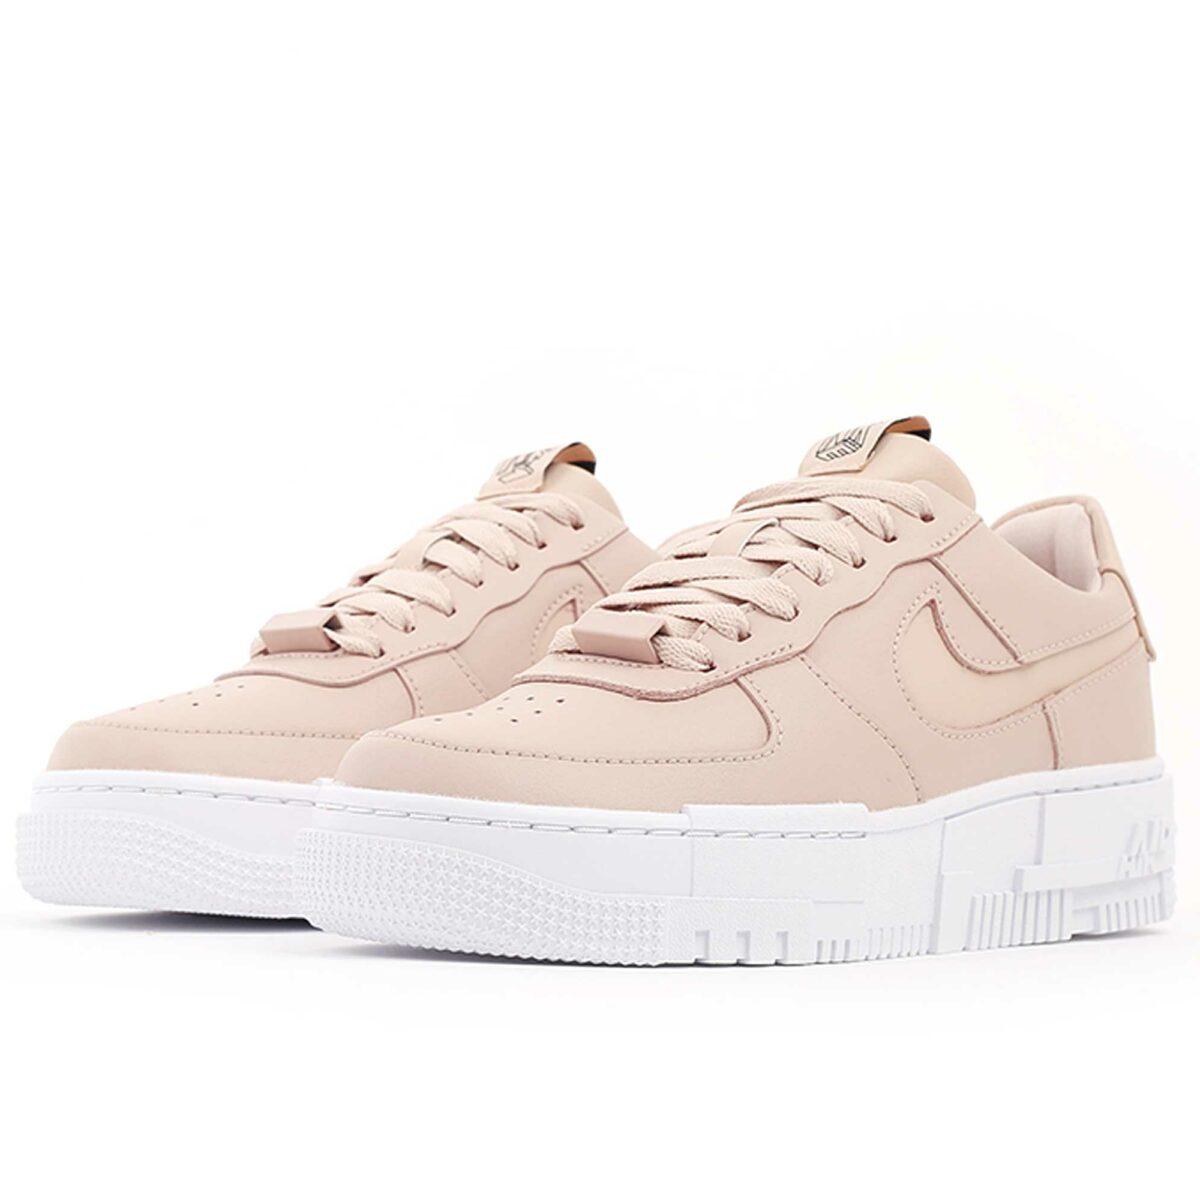 nike air force 1 pixel beige white CK6649_200 купить